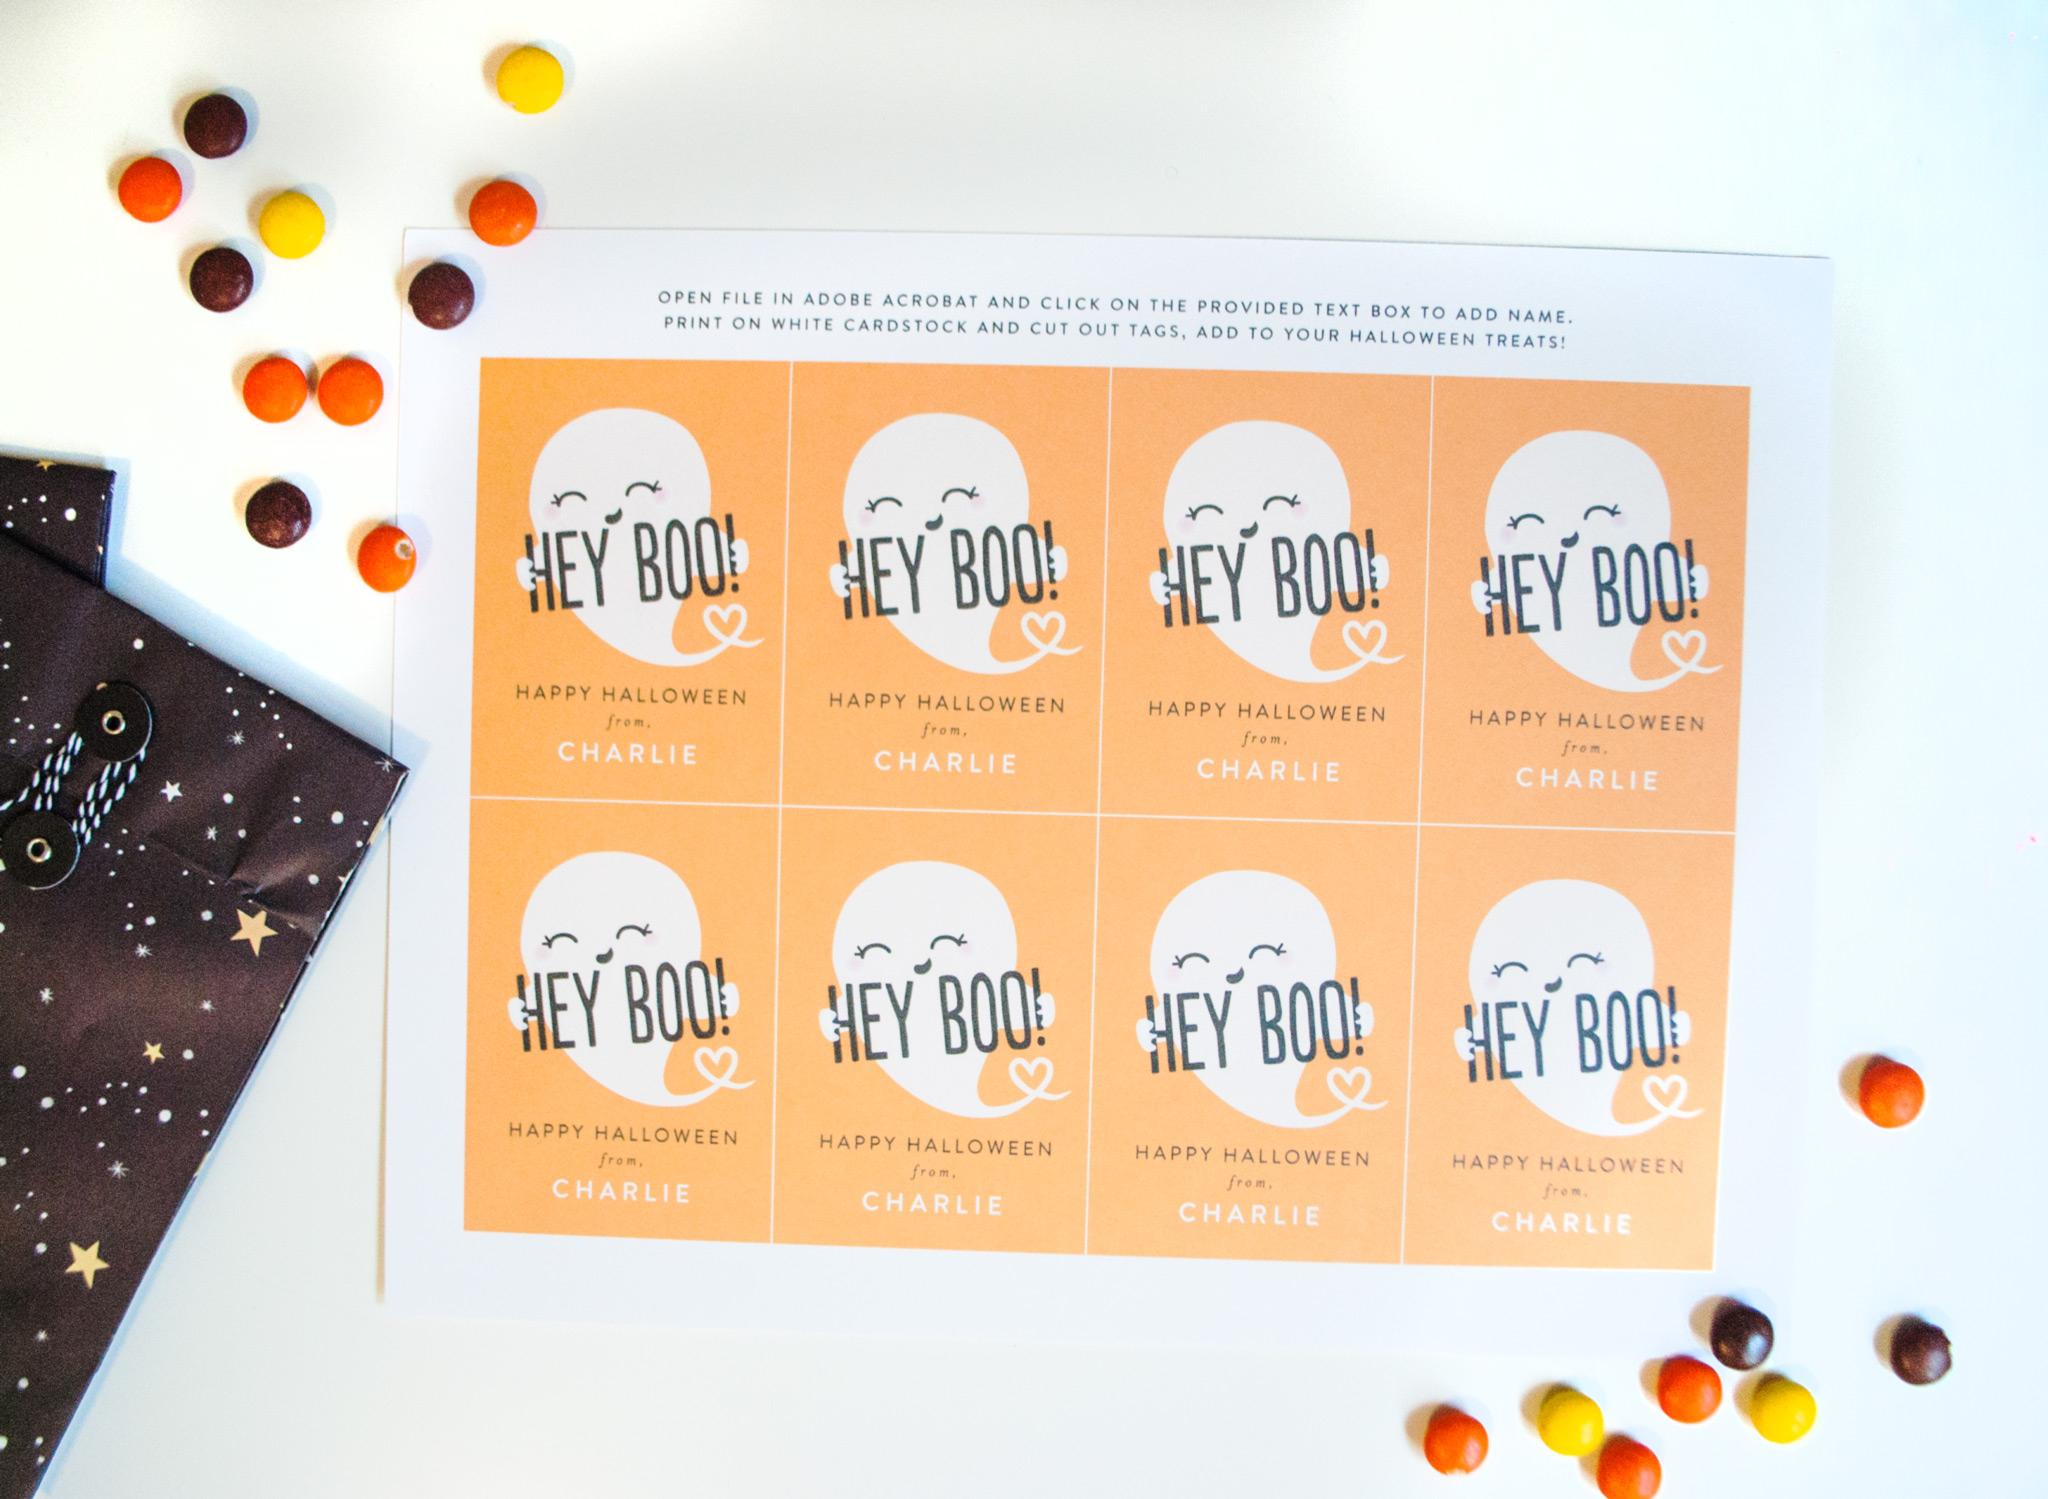 Hey, Boo! Get Your Free Printable Halloween Treat Tags Here - Free Printable Halloween Tags